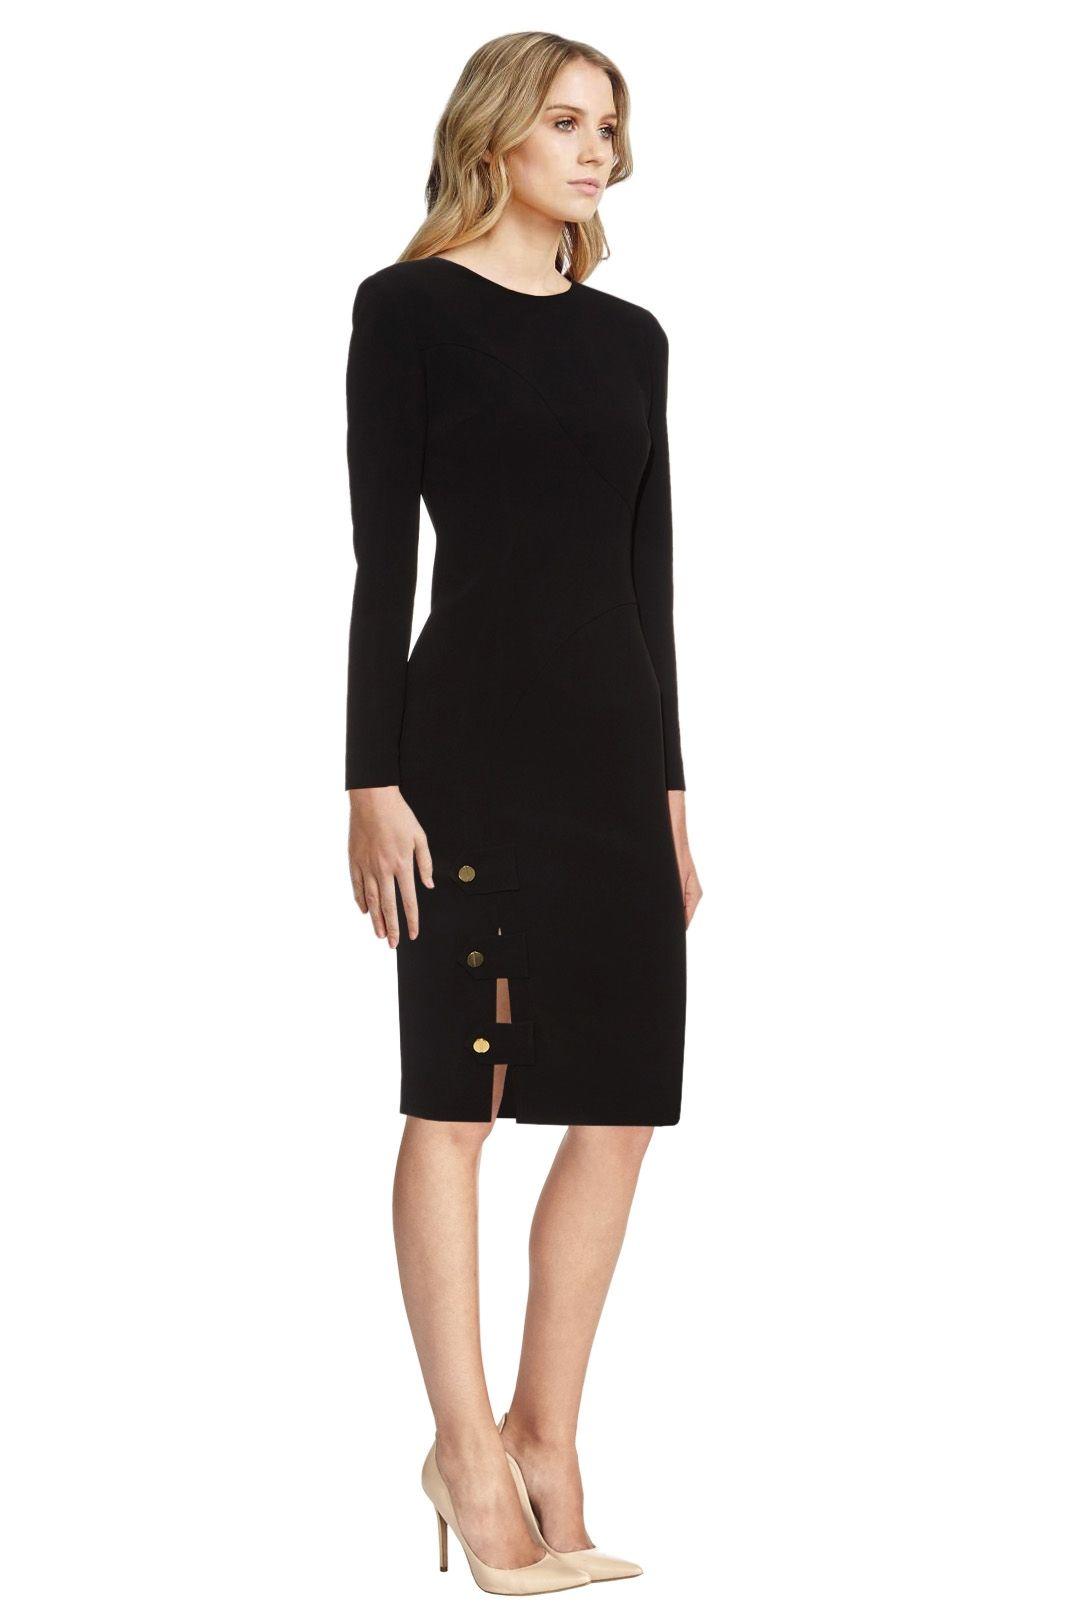 La Mania - Antares Long Sleeved Crepe Dress - Black - Side